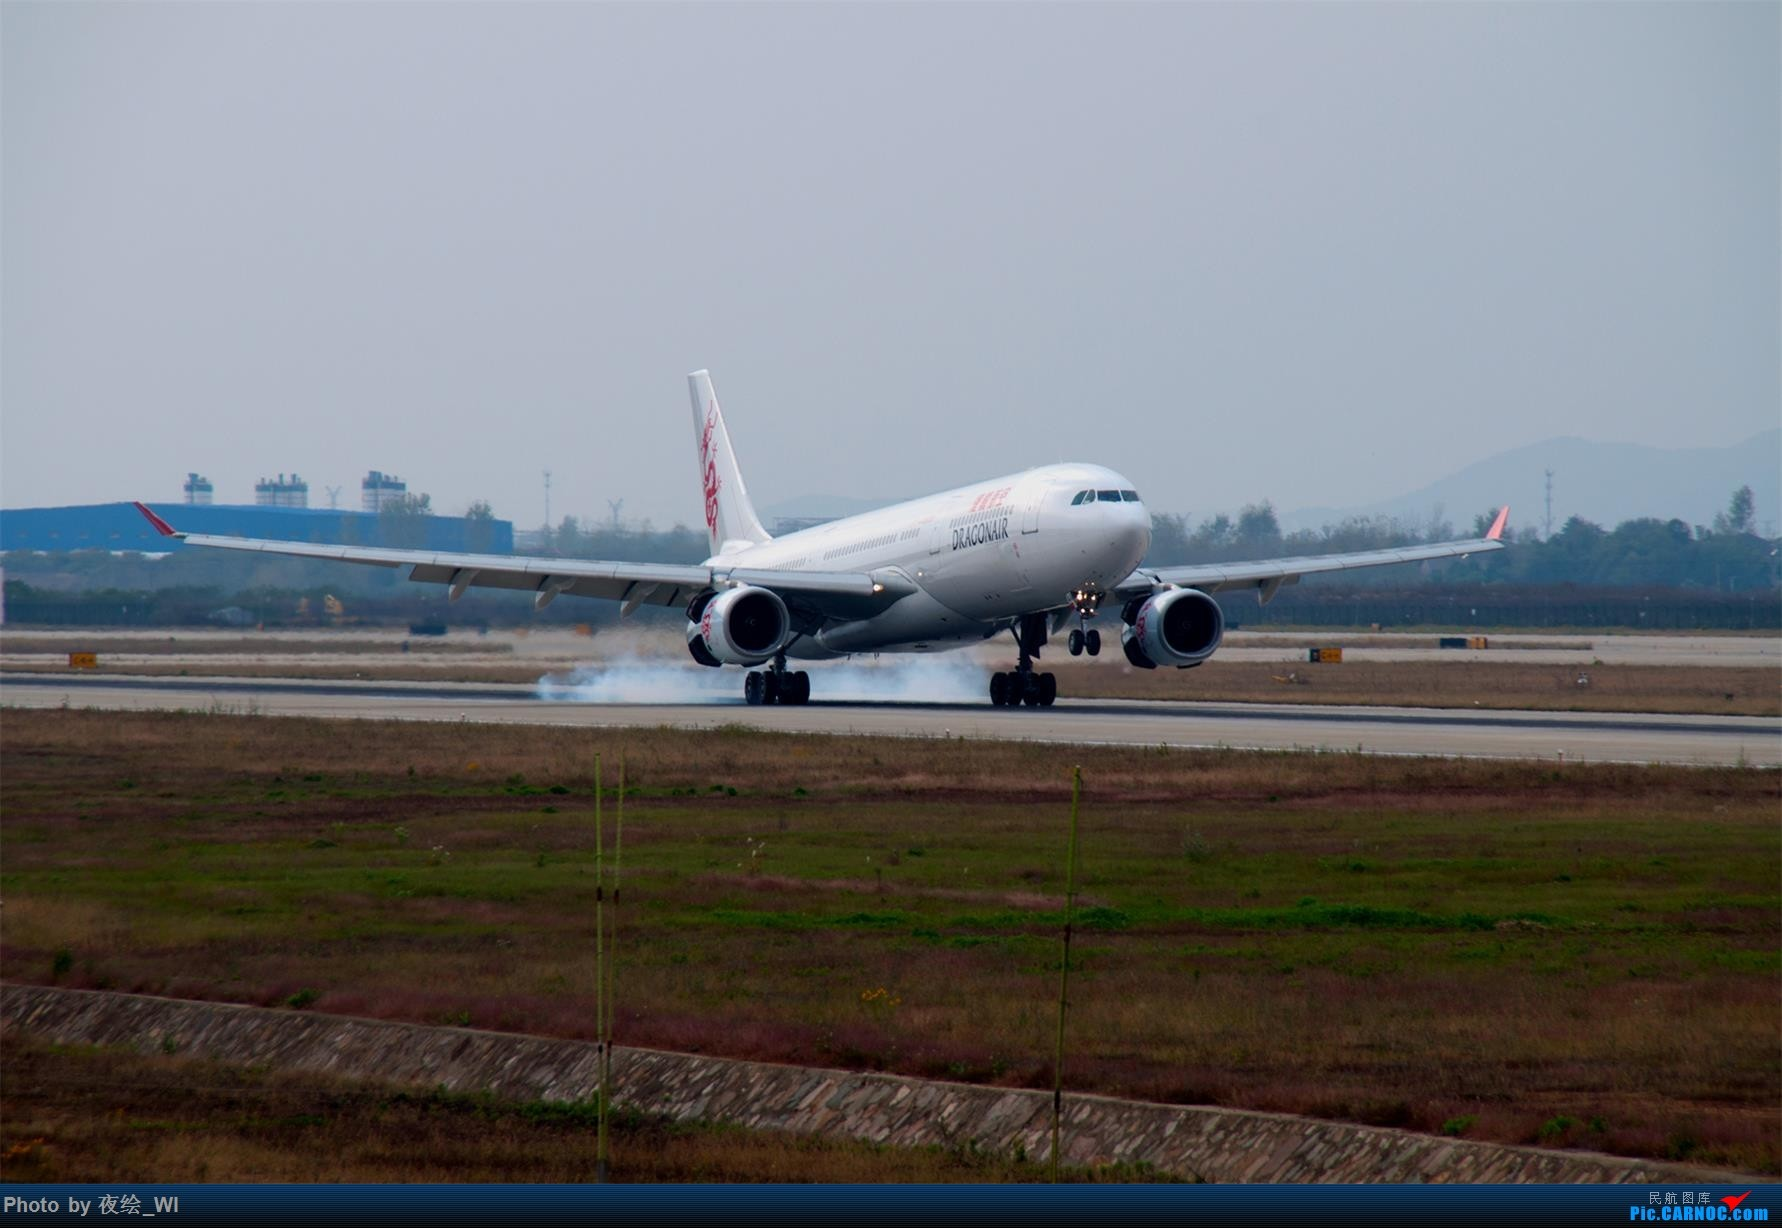 Re:[原创]【NKG】1800*1200,周末随便拍,意外等到好货 AIRBUS A330-300 B-LAA 中国南京禄口国际机场